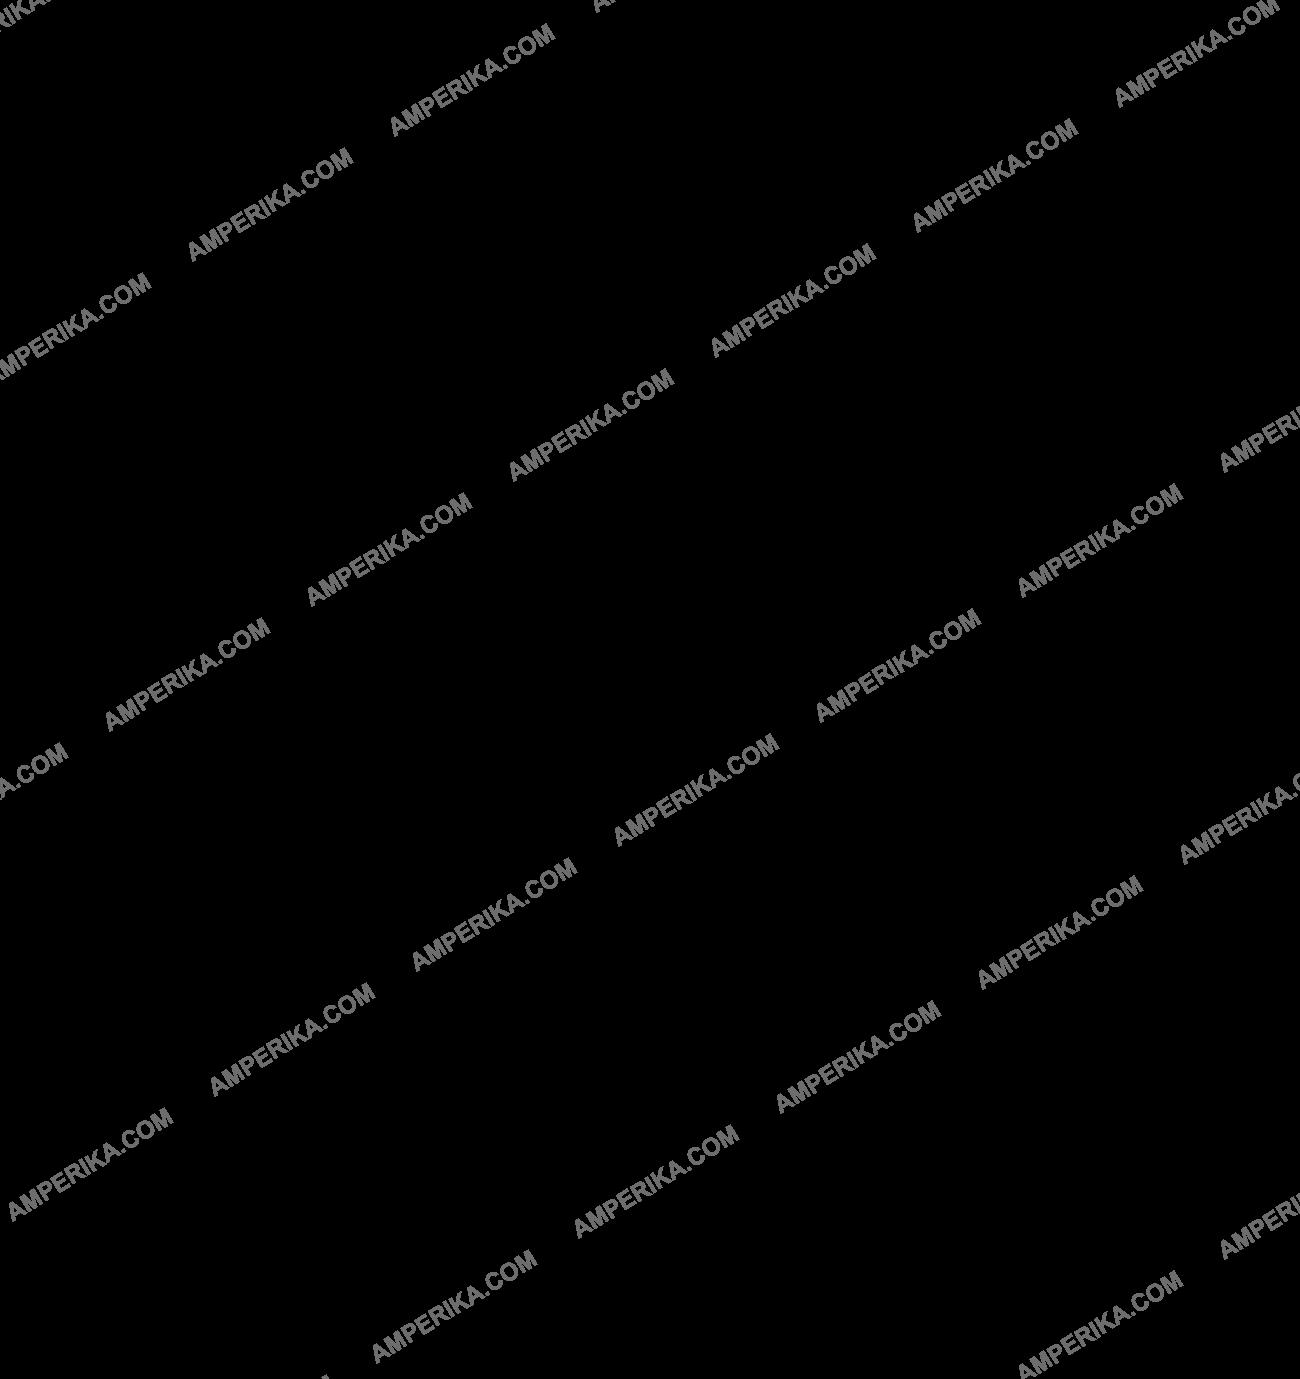 DW-DM04 4-канальный диммер